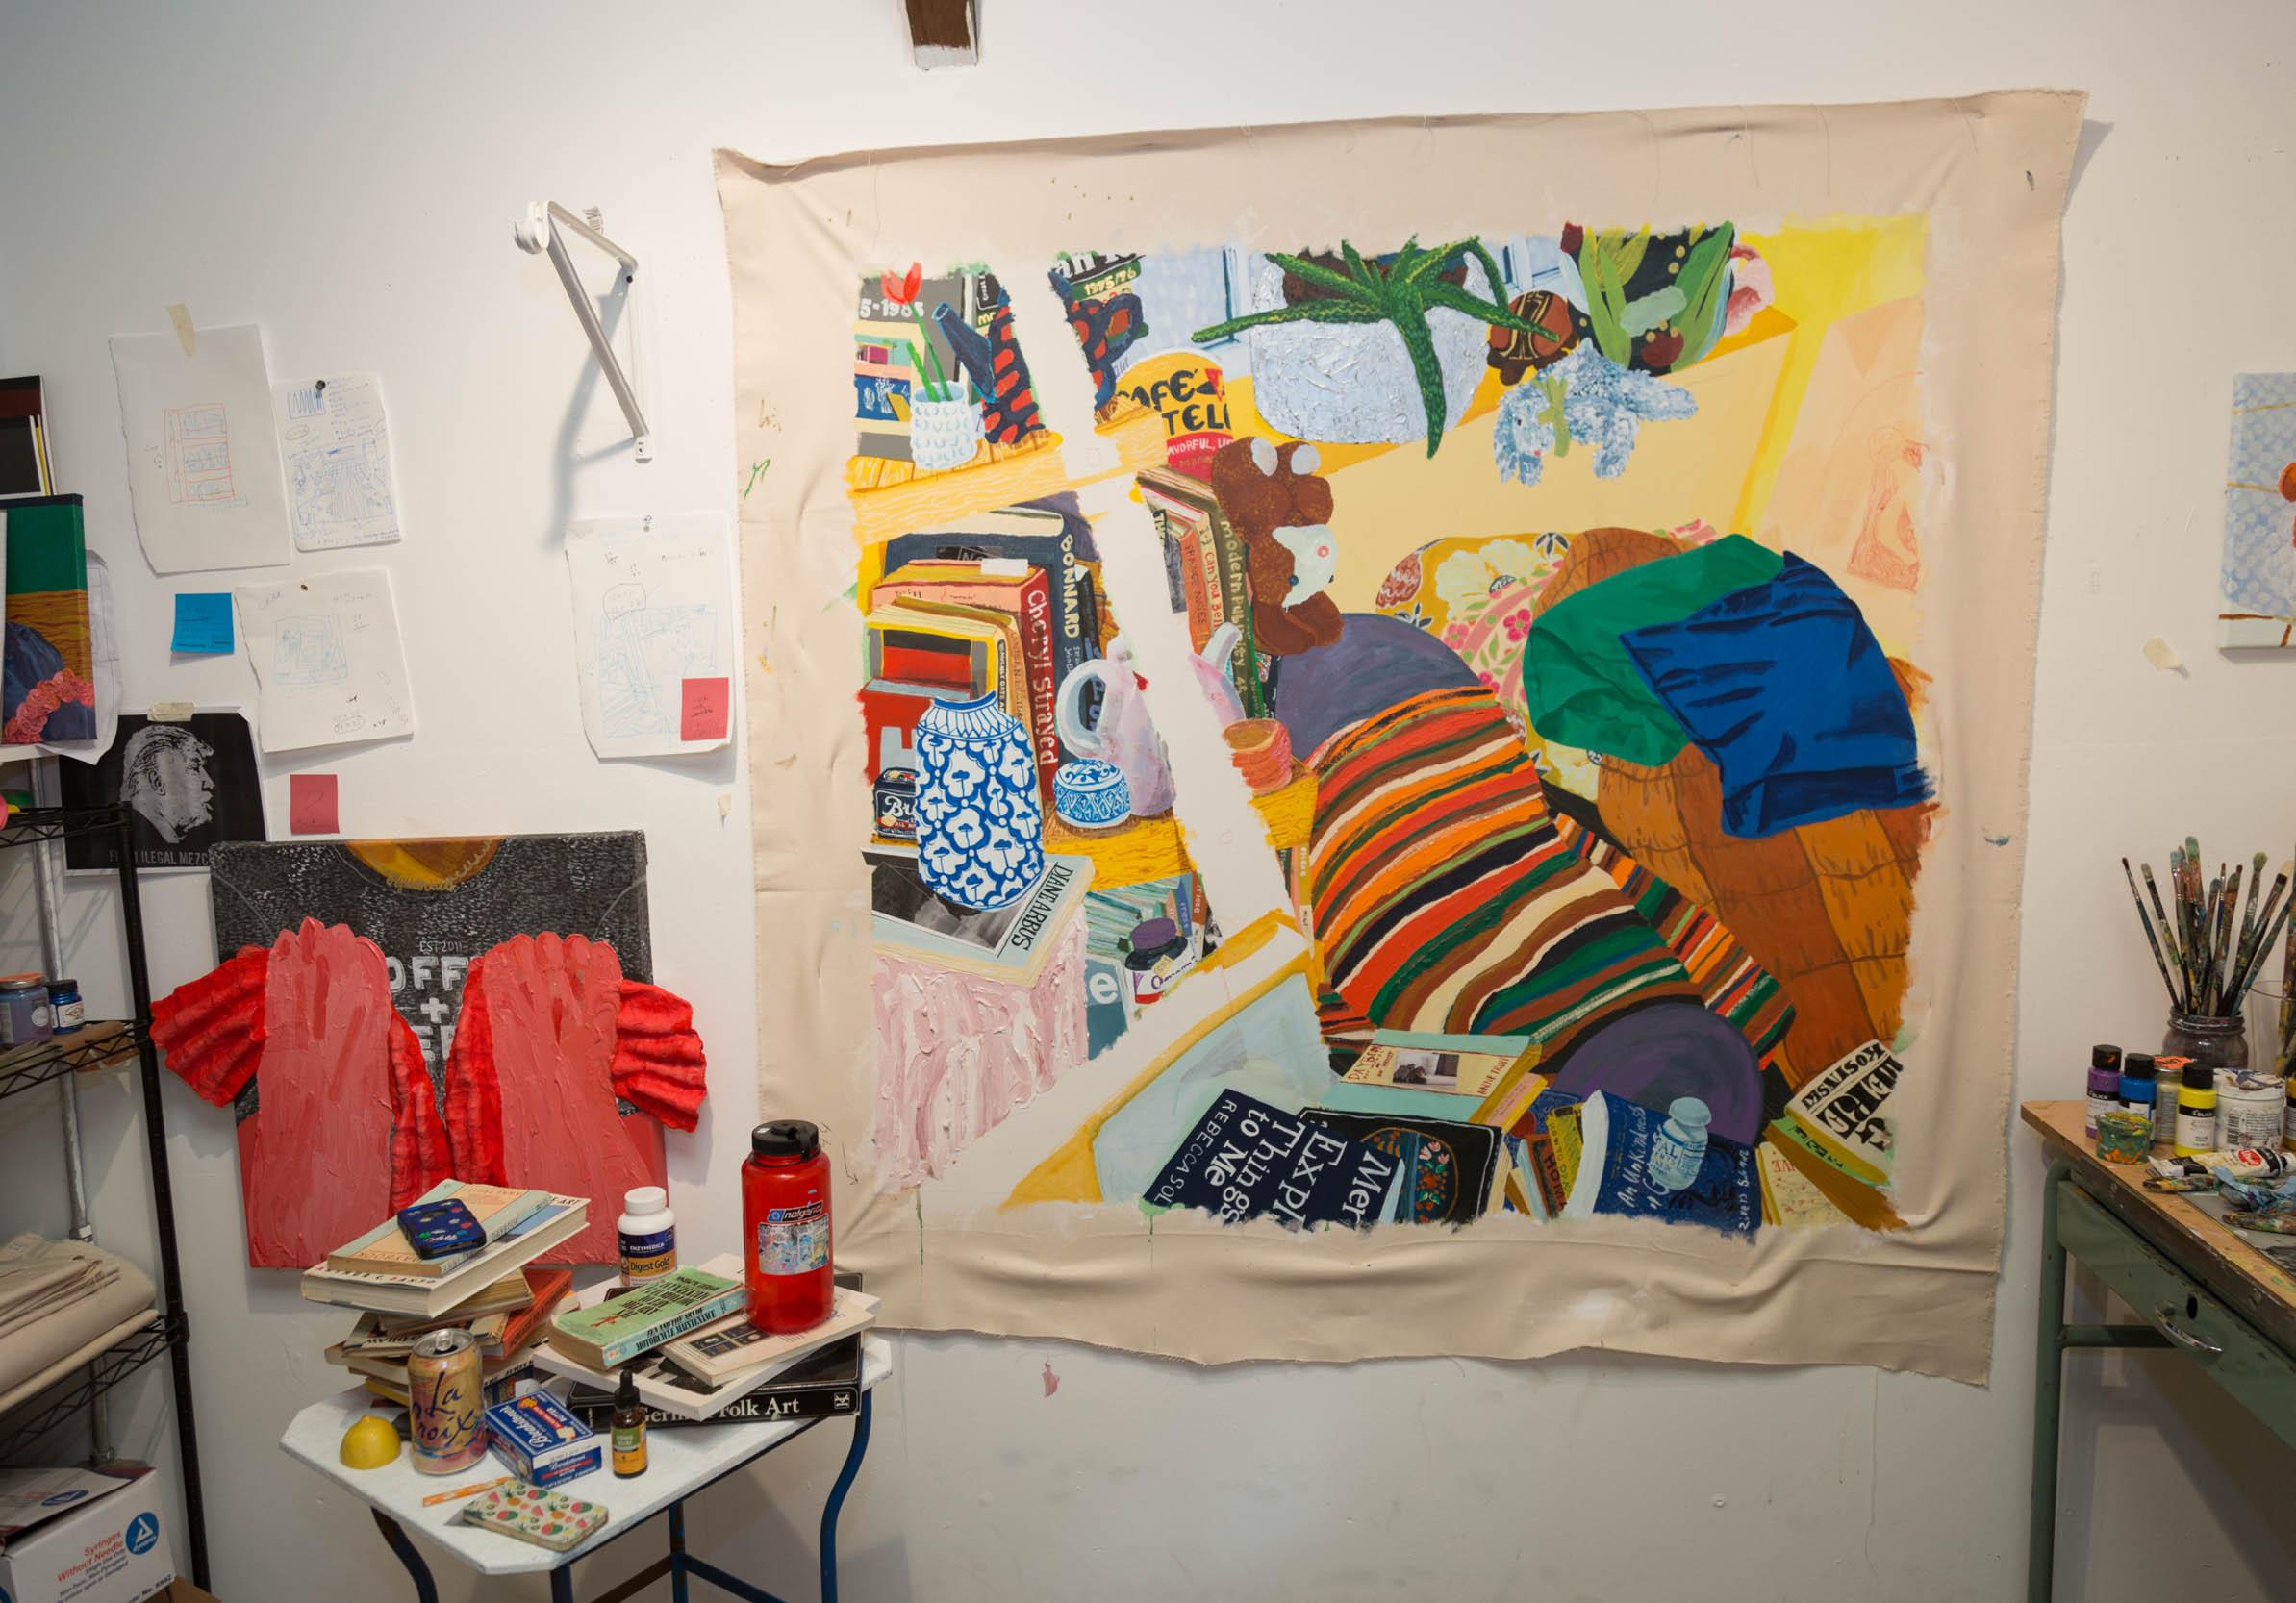 wassaic-project-artist-nicole-dyer-2018-01-29-15-41-32.jpg